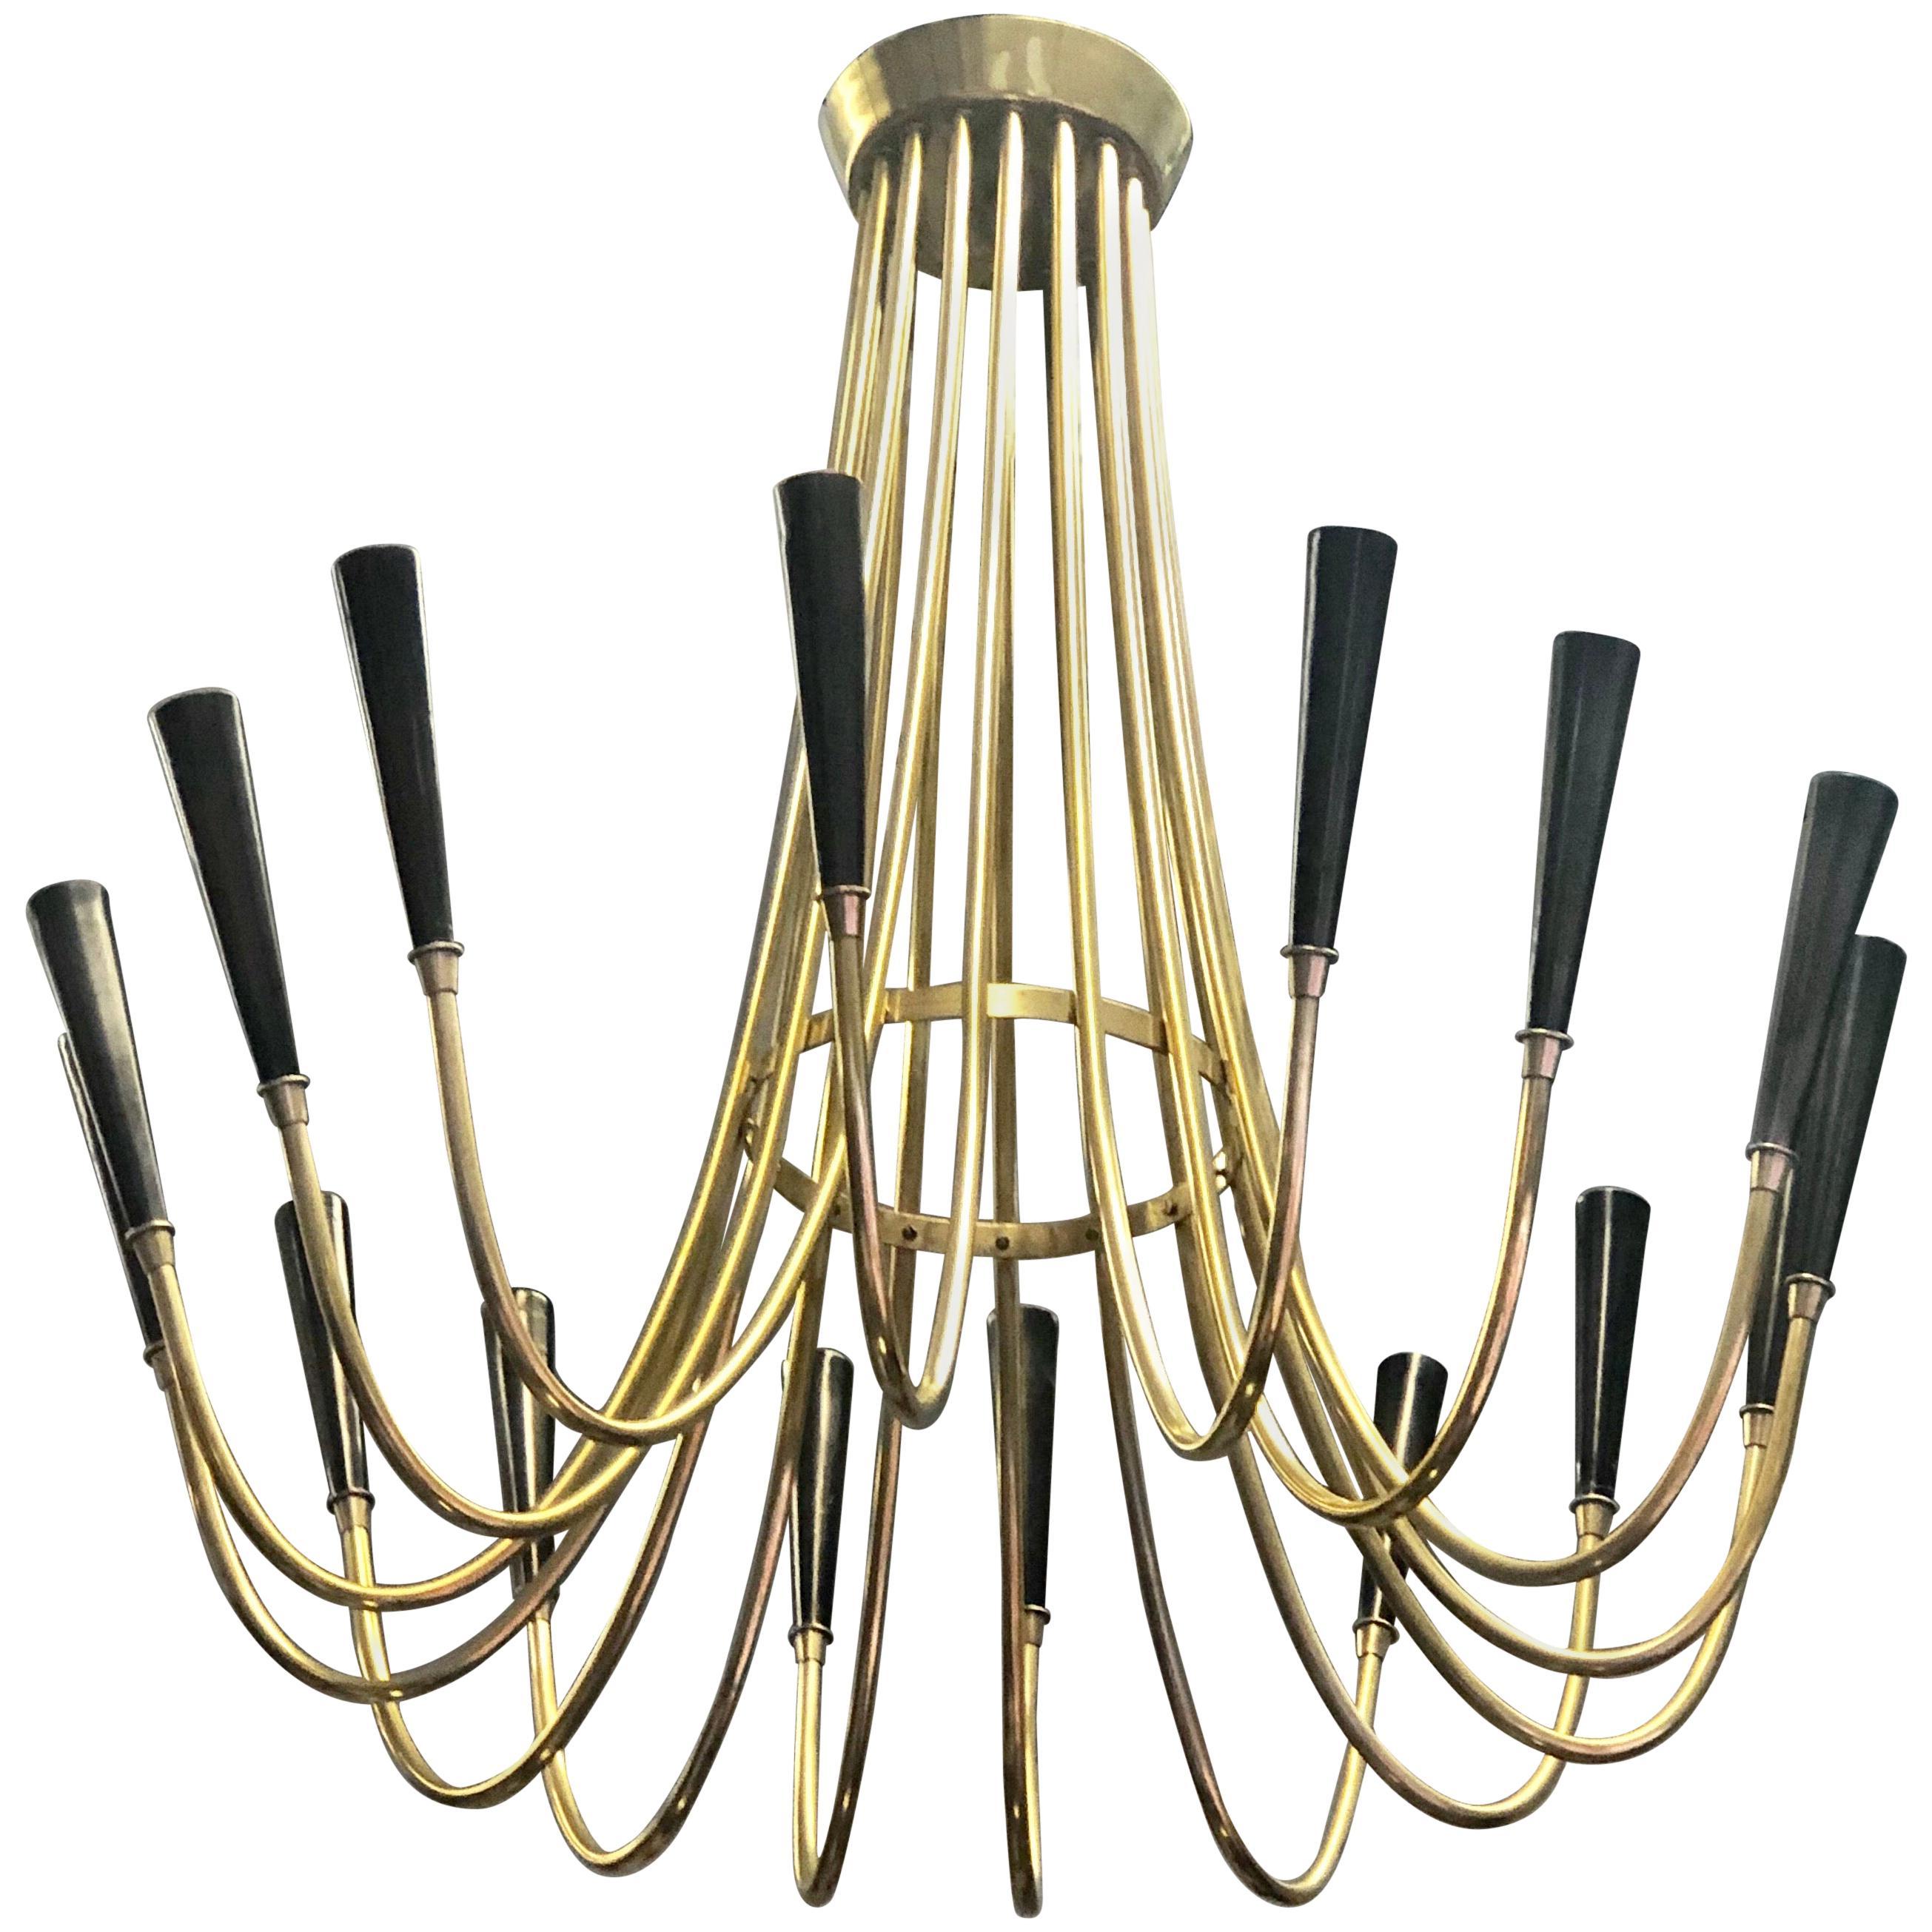 Italian Mid-Century Modern Brass Chandelier Attribute to Ulrich